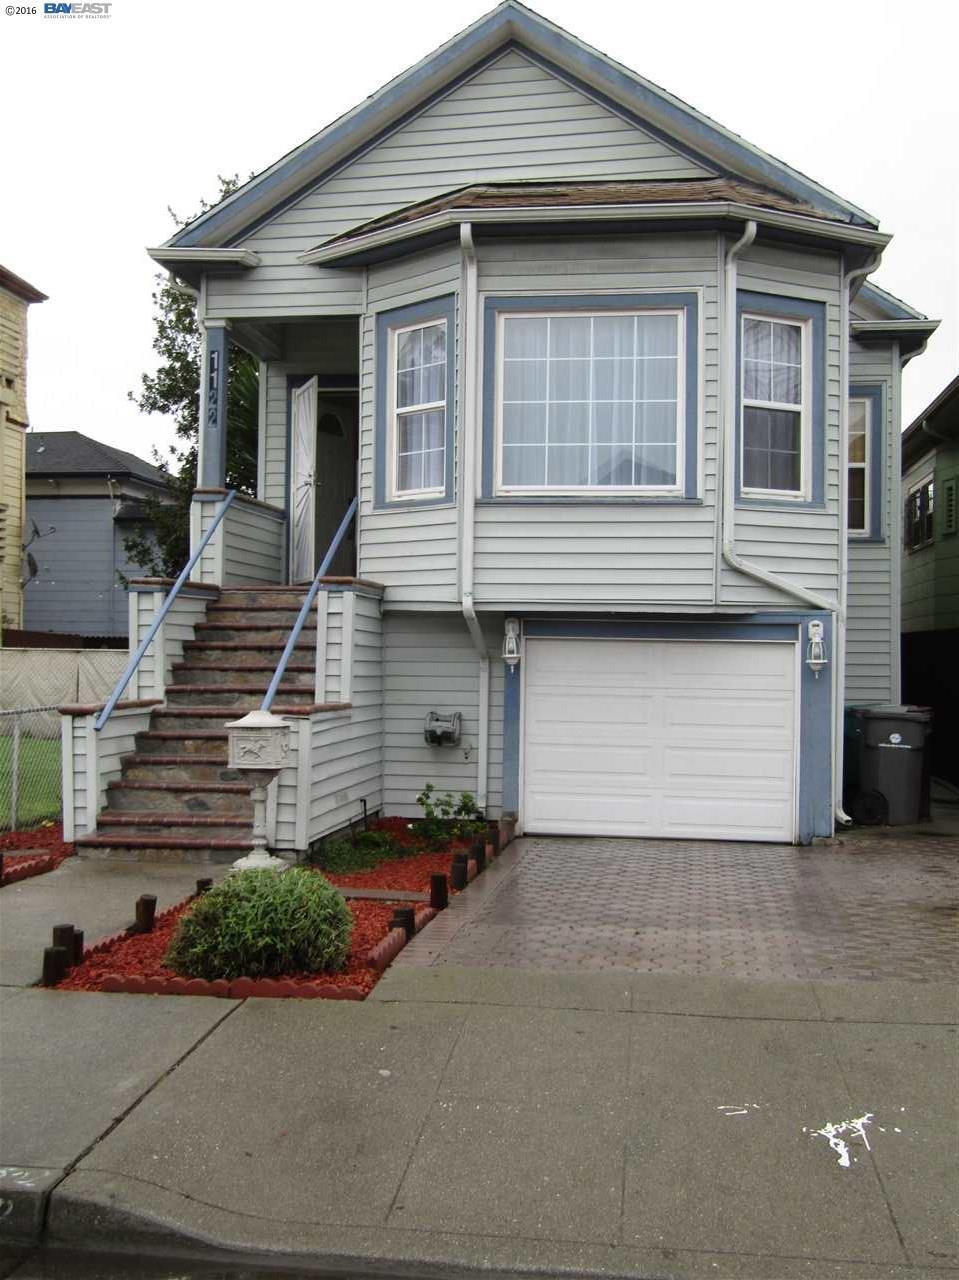 1122 Chestnut St, Oakland, CA